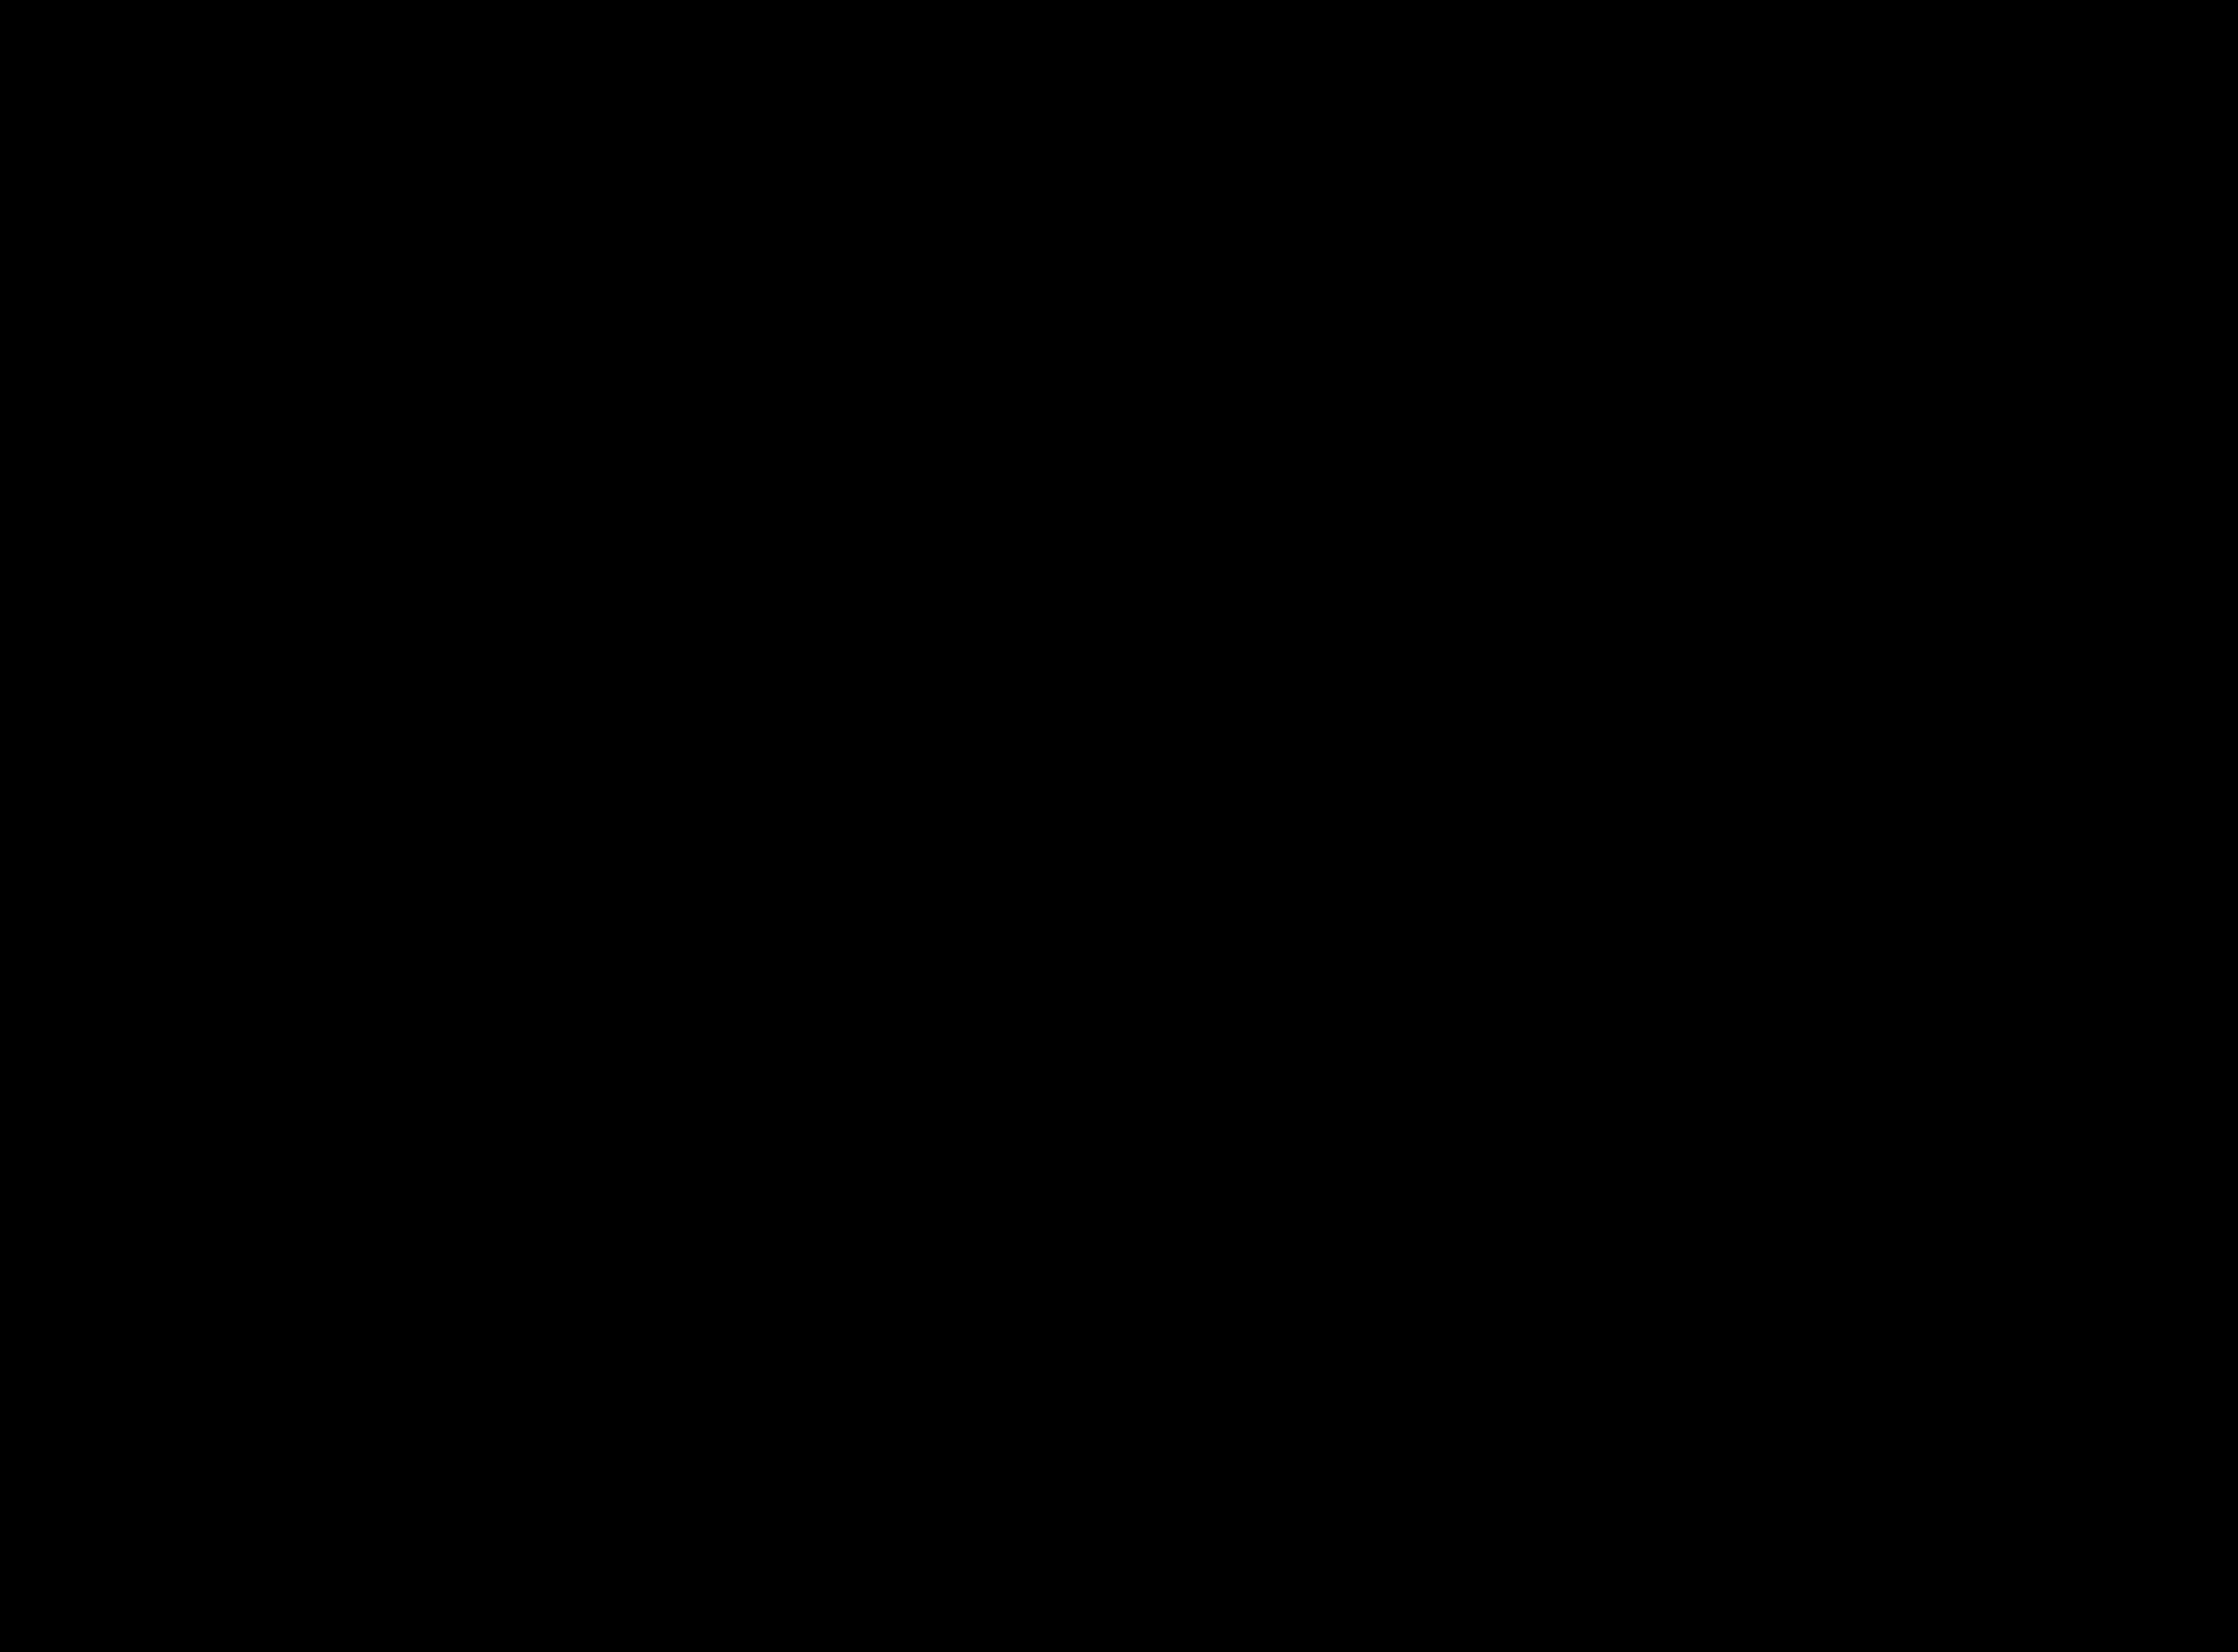 2254x1664 Clipart